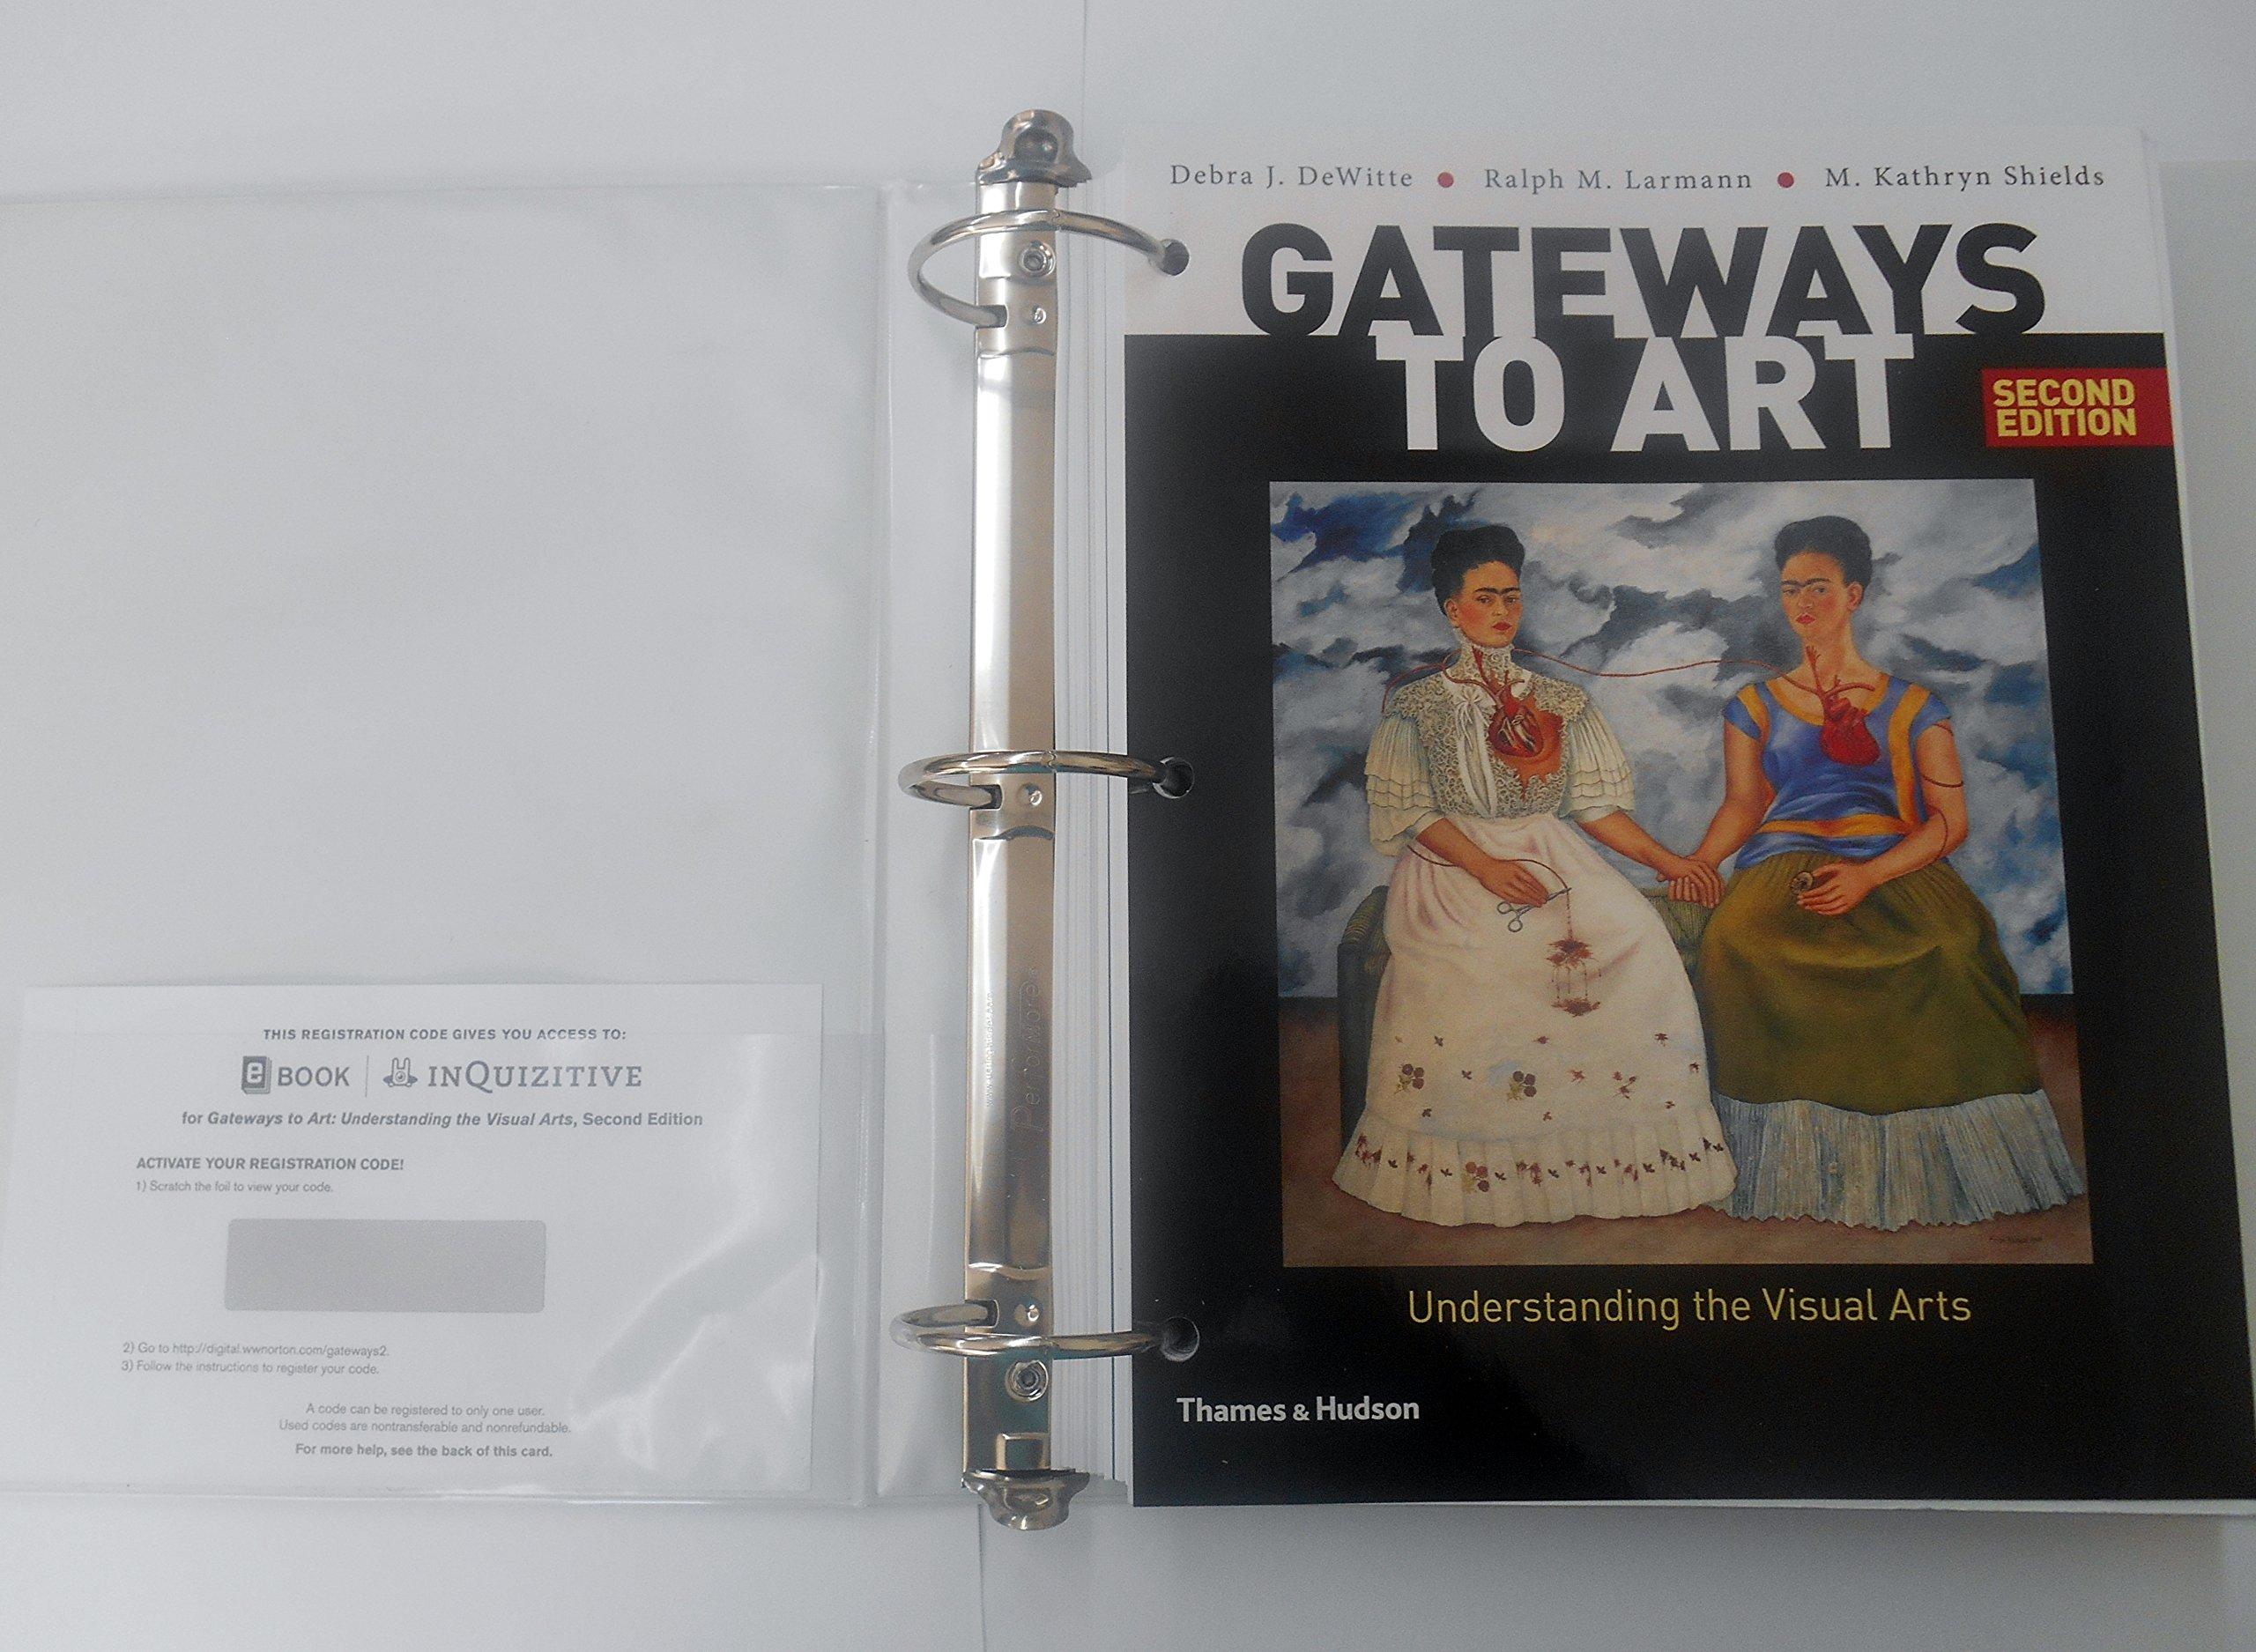 Elements And Organization Of Visual Arts : Gateways to art understanding the visual arts debra j dewitte